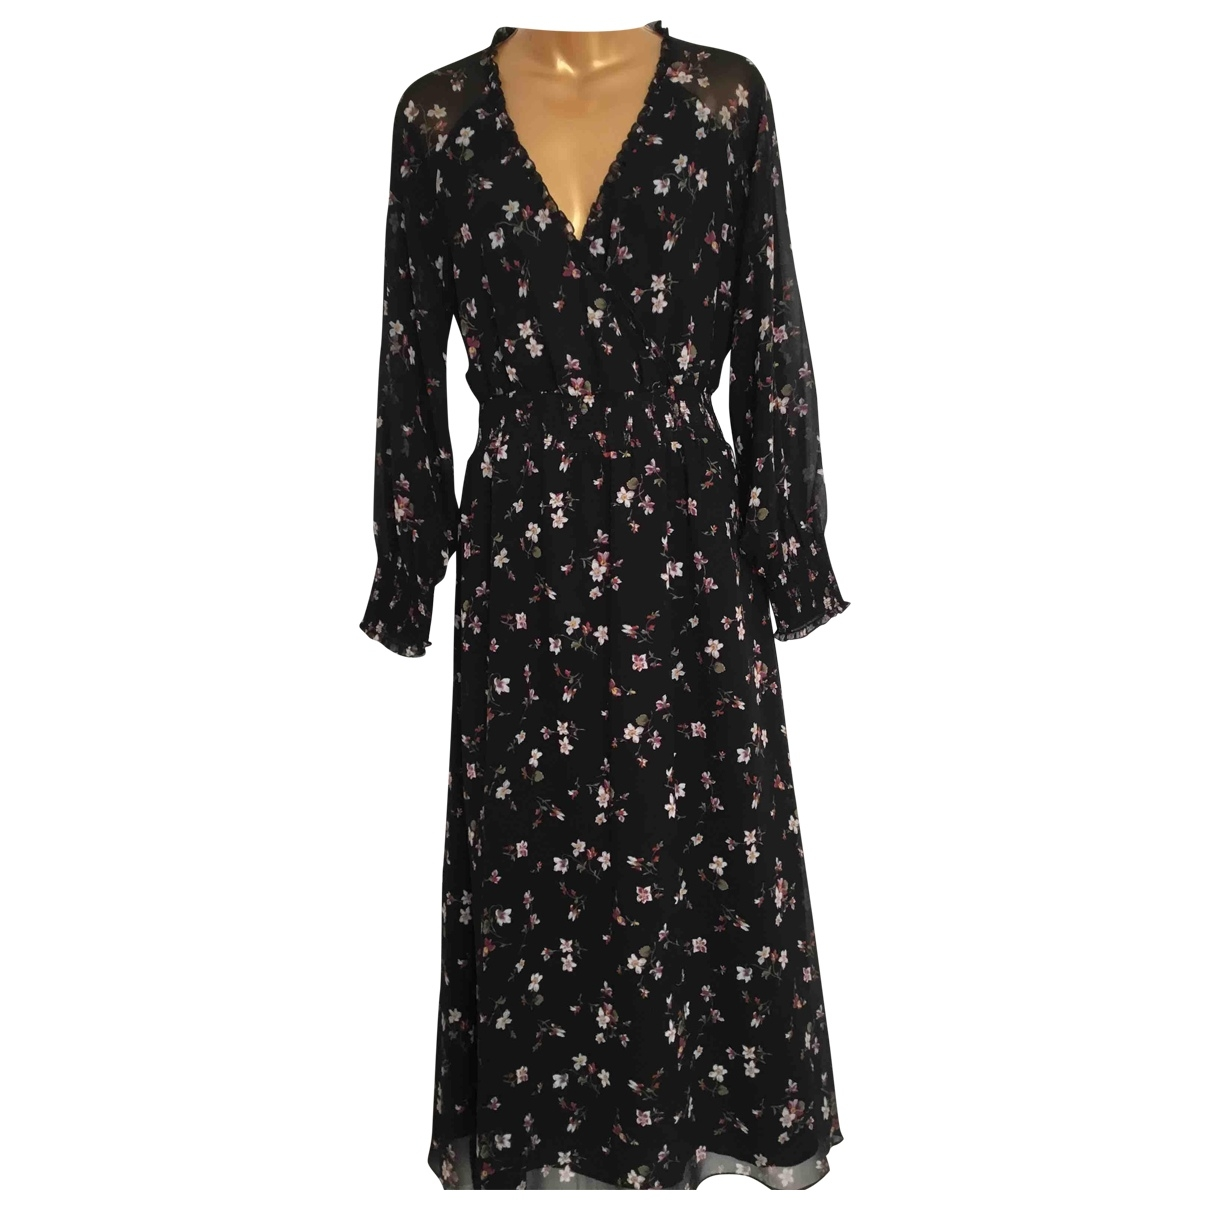 Madewell \N Kleid in  Schwarz Polyester